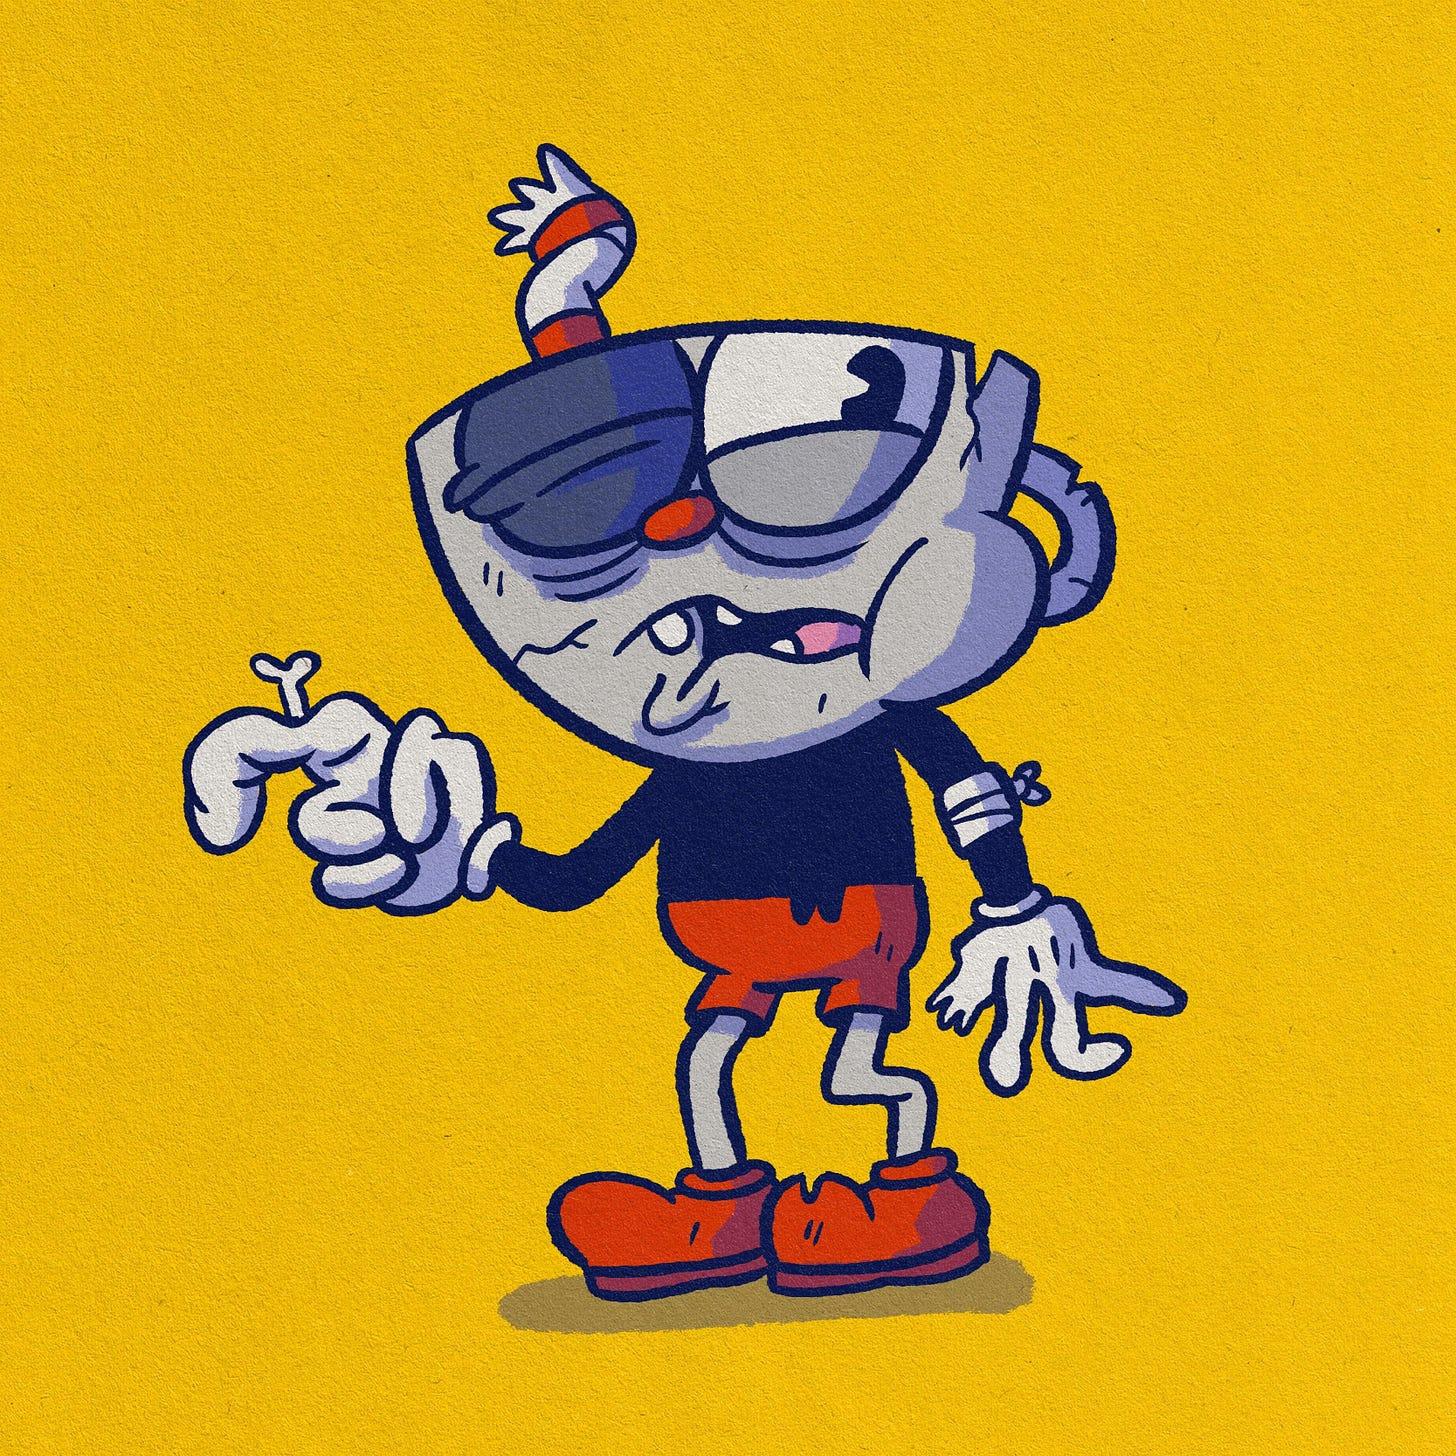 Cuphead illustration, represente un personnage qui en pris plein la figure